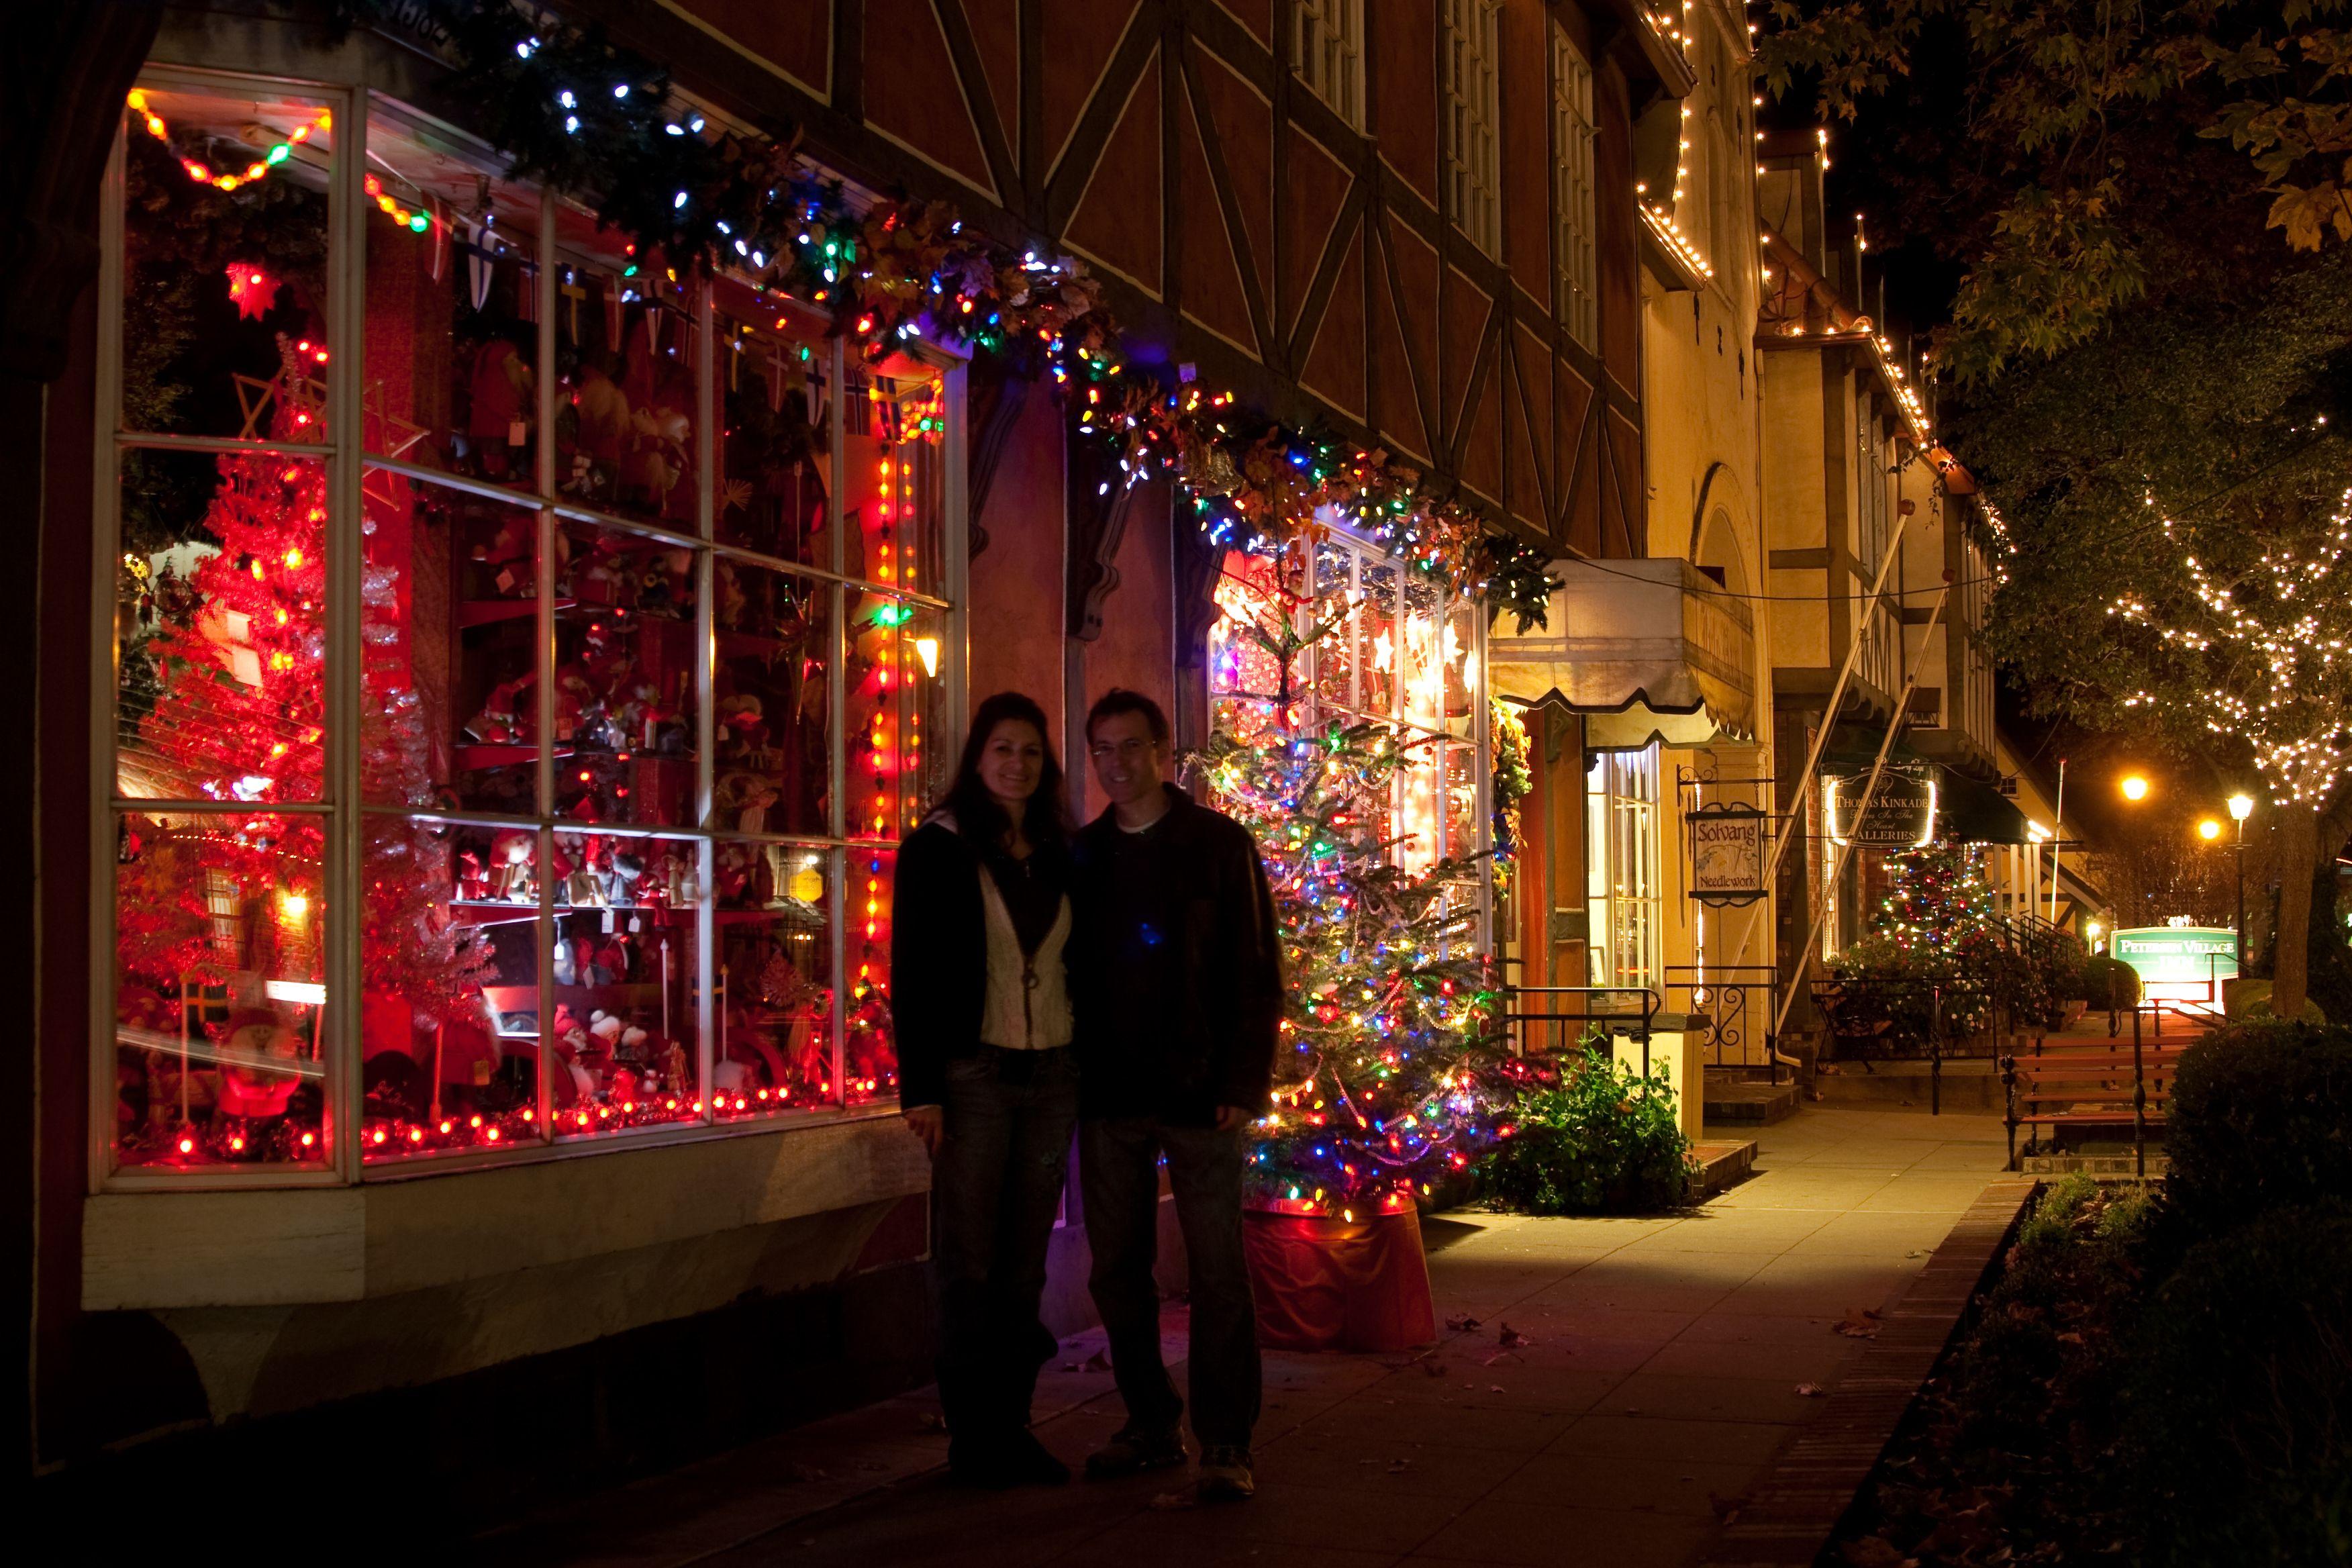 Solvang Ca Christmas.Chris Cheryl Price Christmas Decor In Solvang Ca